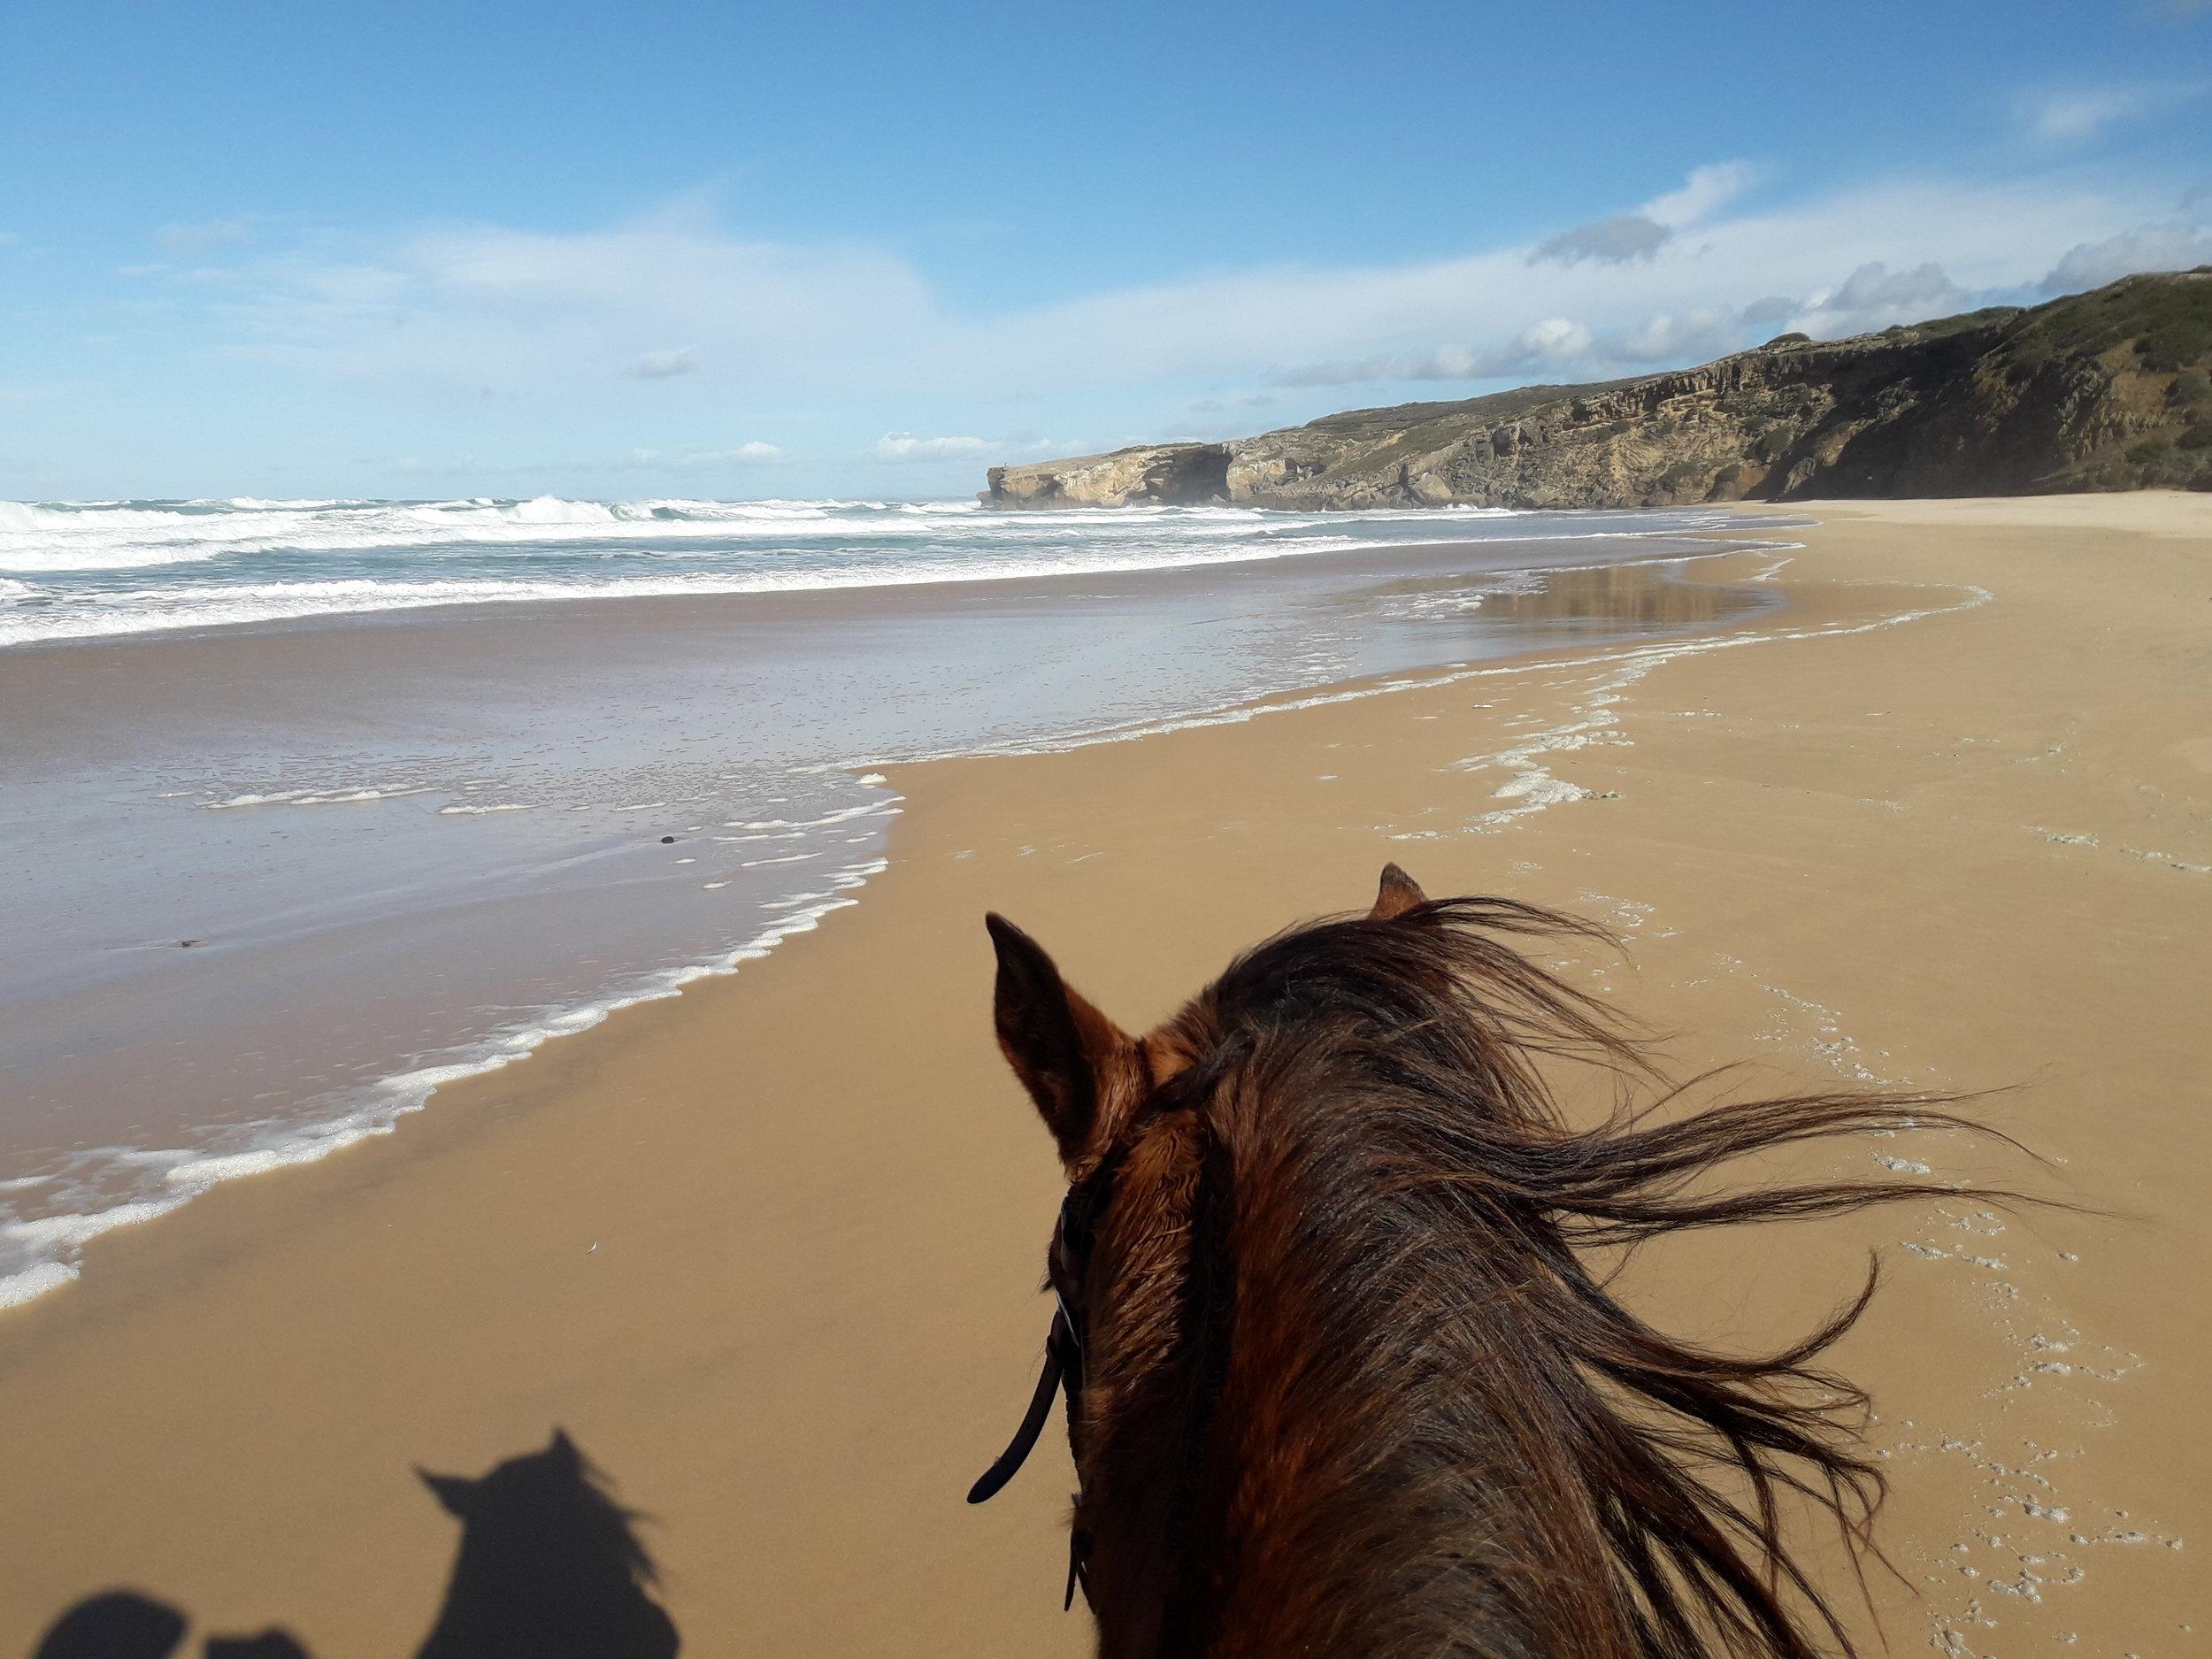 Pferd-Strand-Meer-Wellen-Küste-Monte Clerigo.jpg